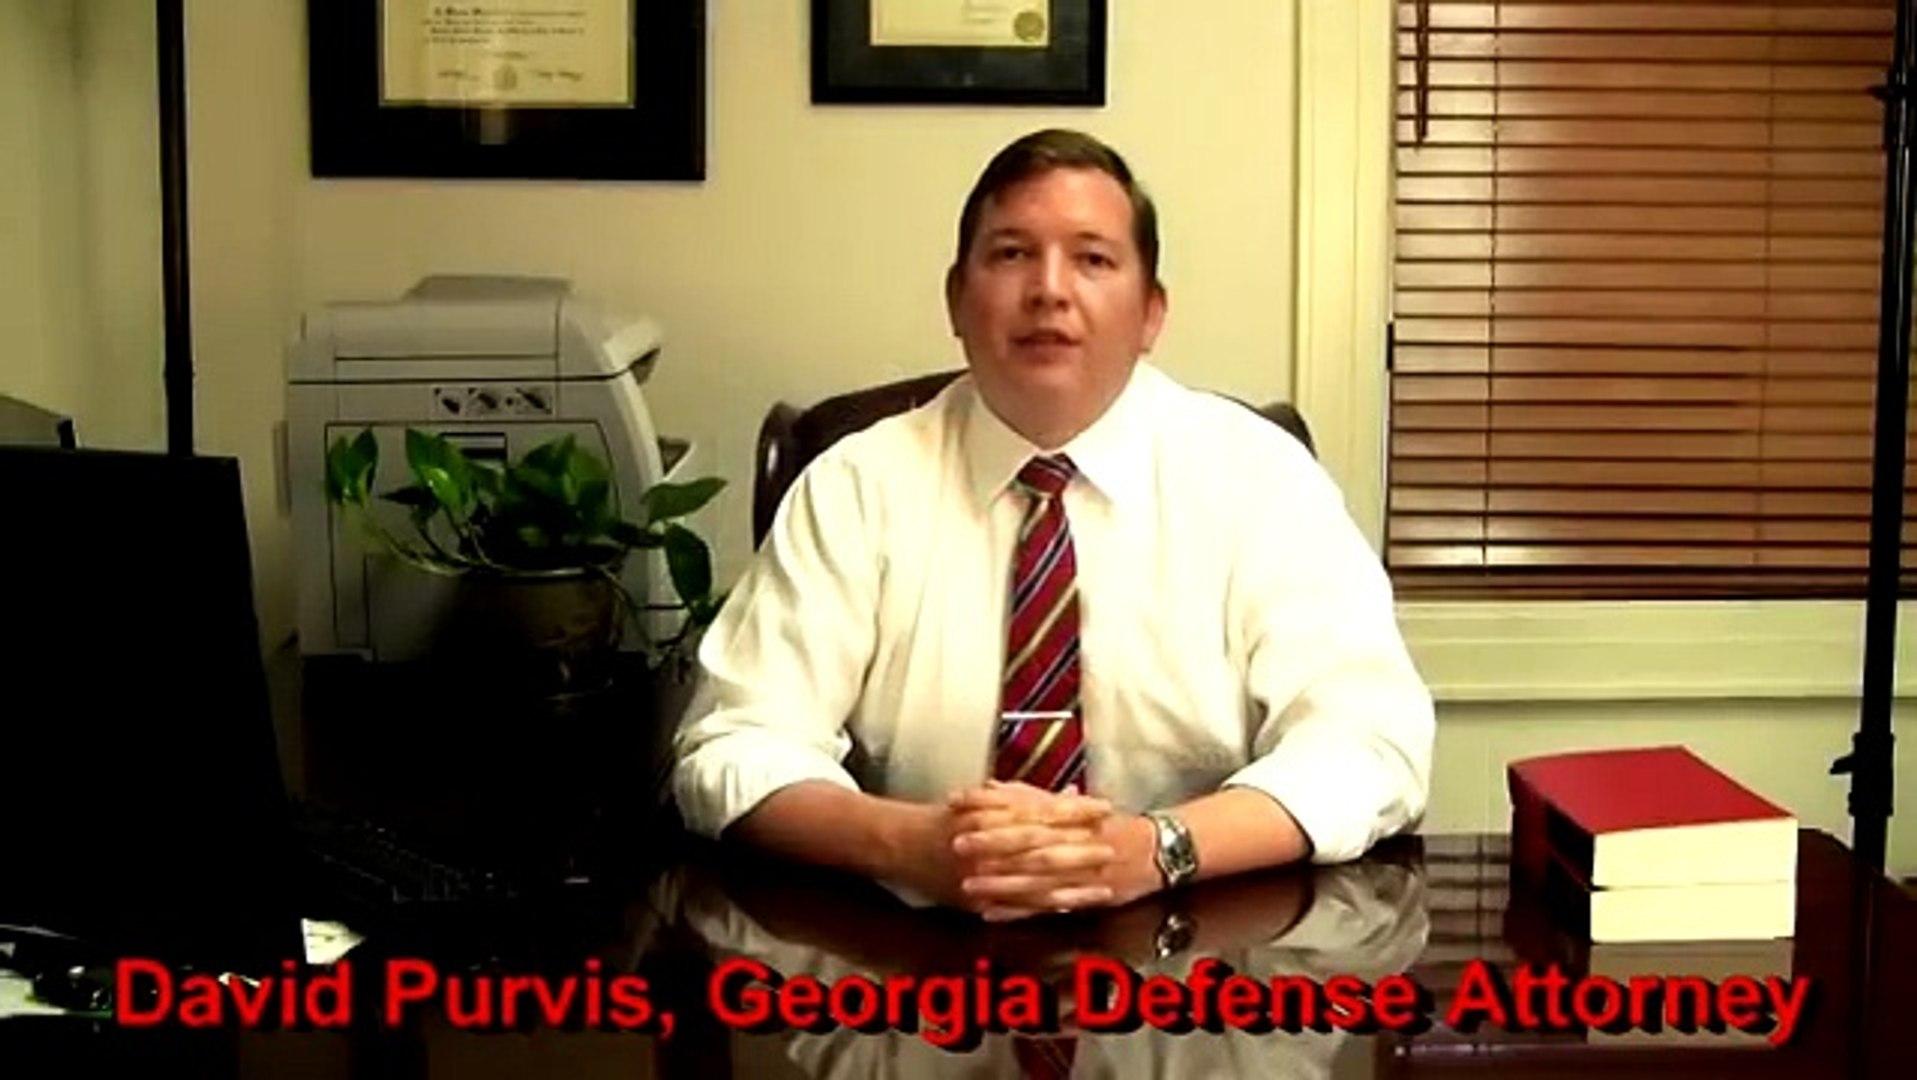 Miranda (1/3): Georgia Criminal Defense Lawyer Discusses What are Miranda Rights?